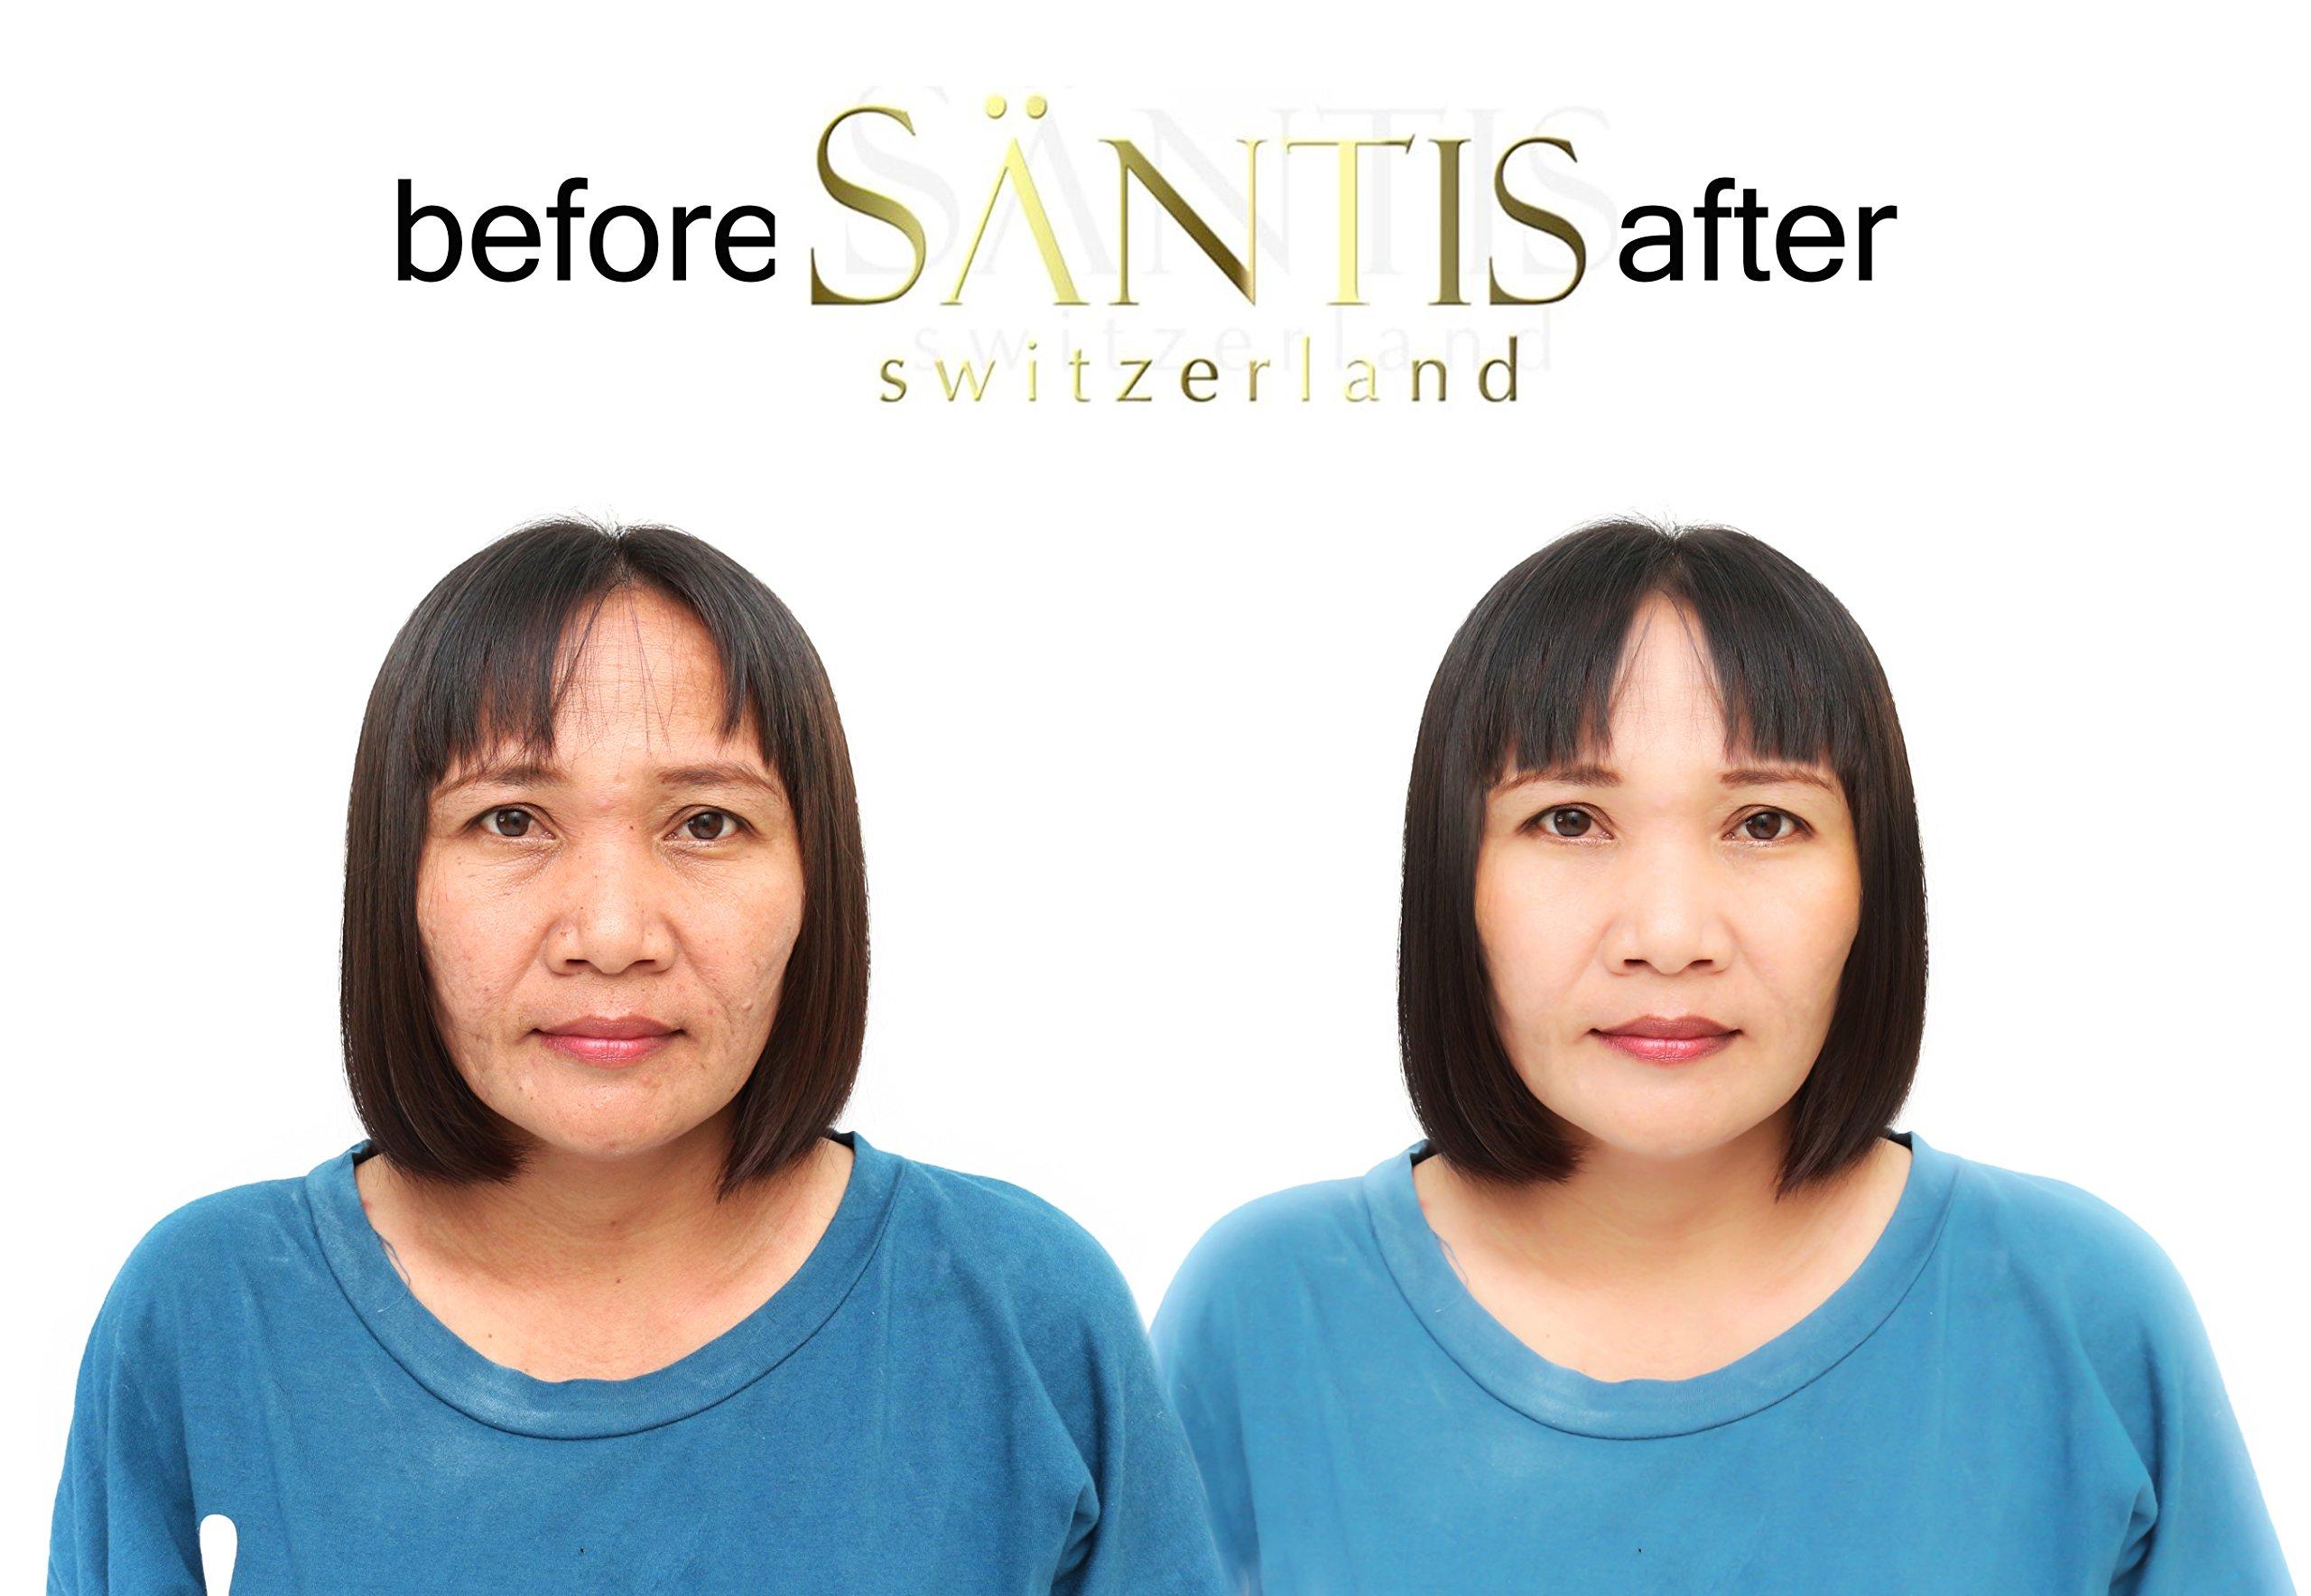 Santis Botox Alternative Anti Wrinkle Filler Kit Contain Cellular Serum & Filling Cream Tightens Skin Instantly & Painlessly - Eliminates Age Spots, Dark Circles, Smoothens Fine Lines by SANTIS SWITZERLAND (Image #4)